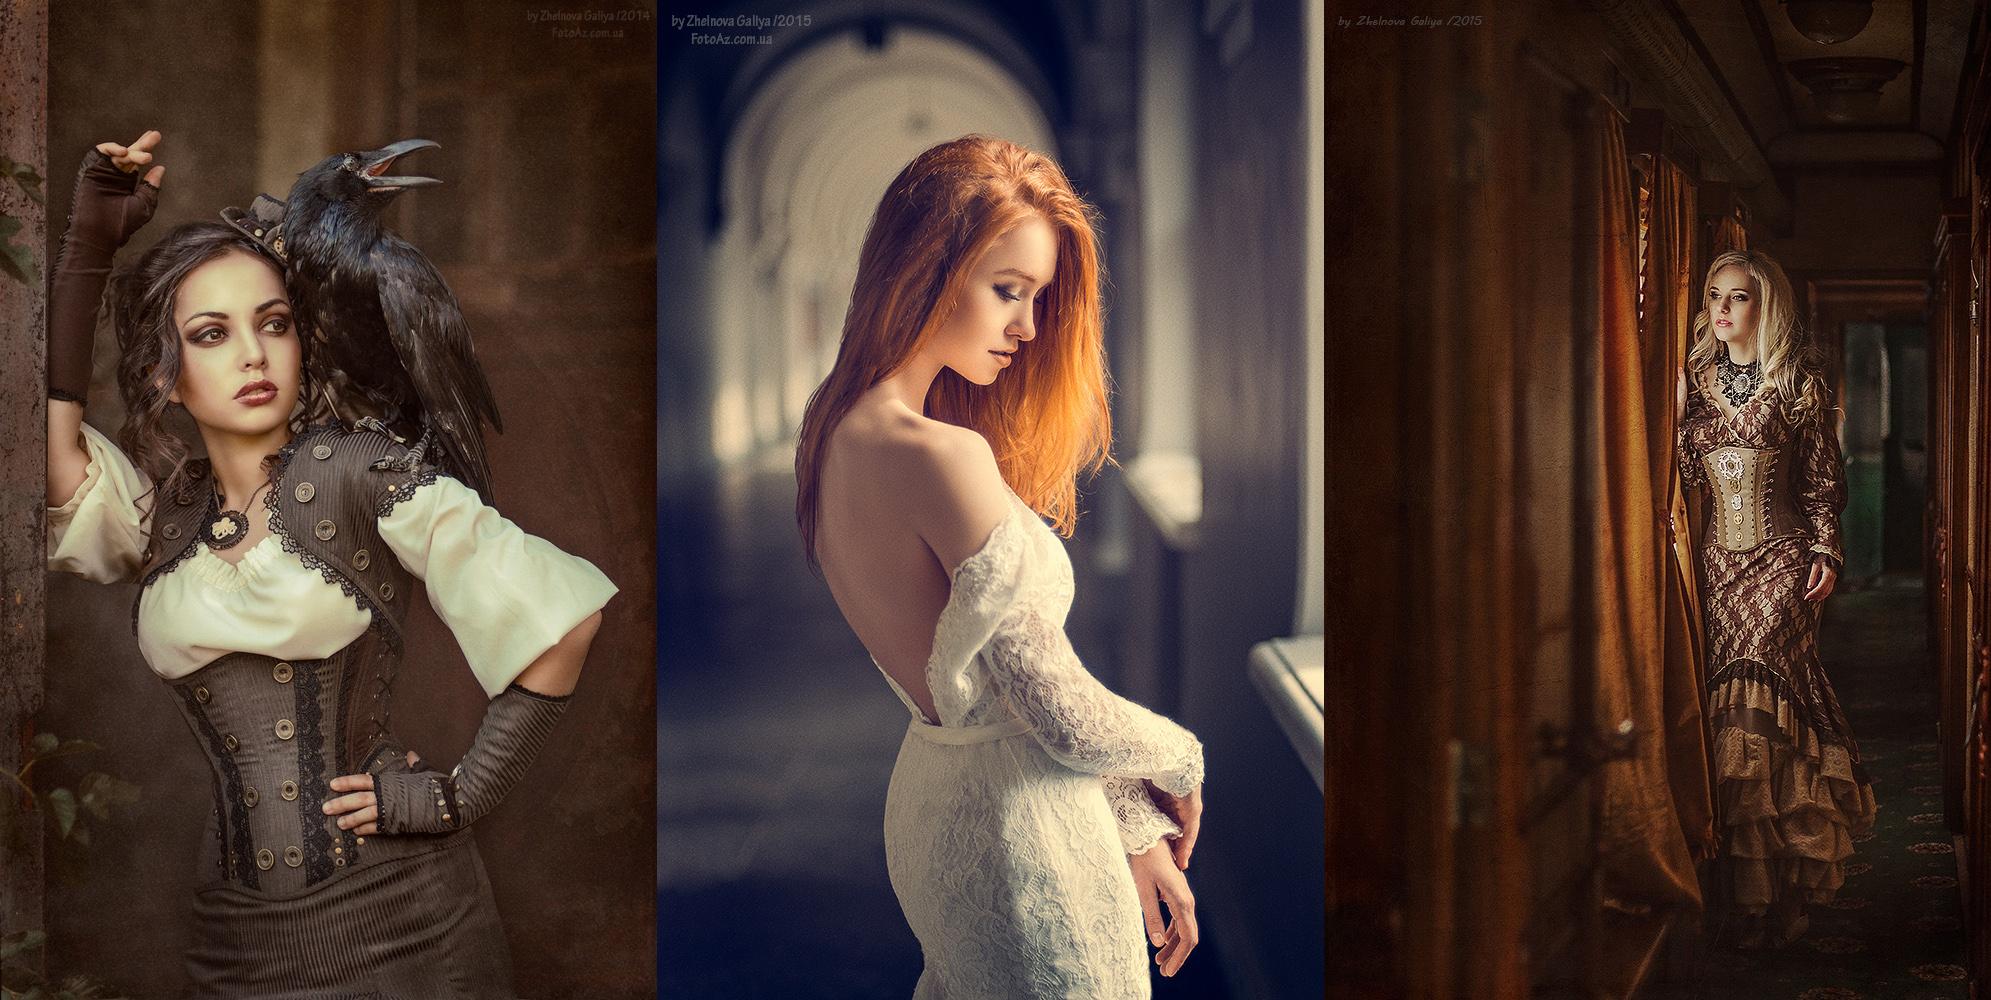 The Sexy and Surreal Portraits of Galiya Zhelnova (NSFW)